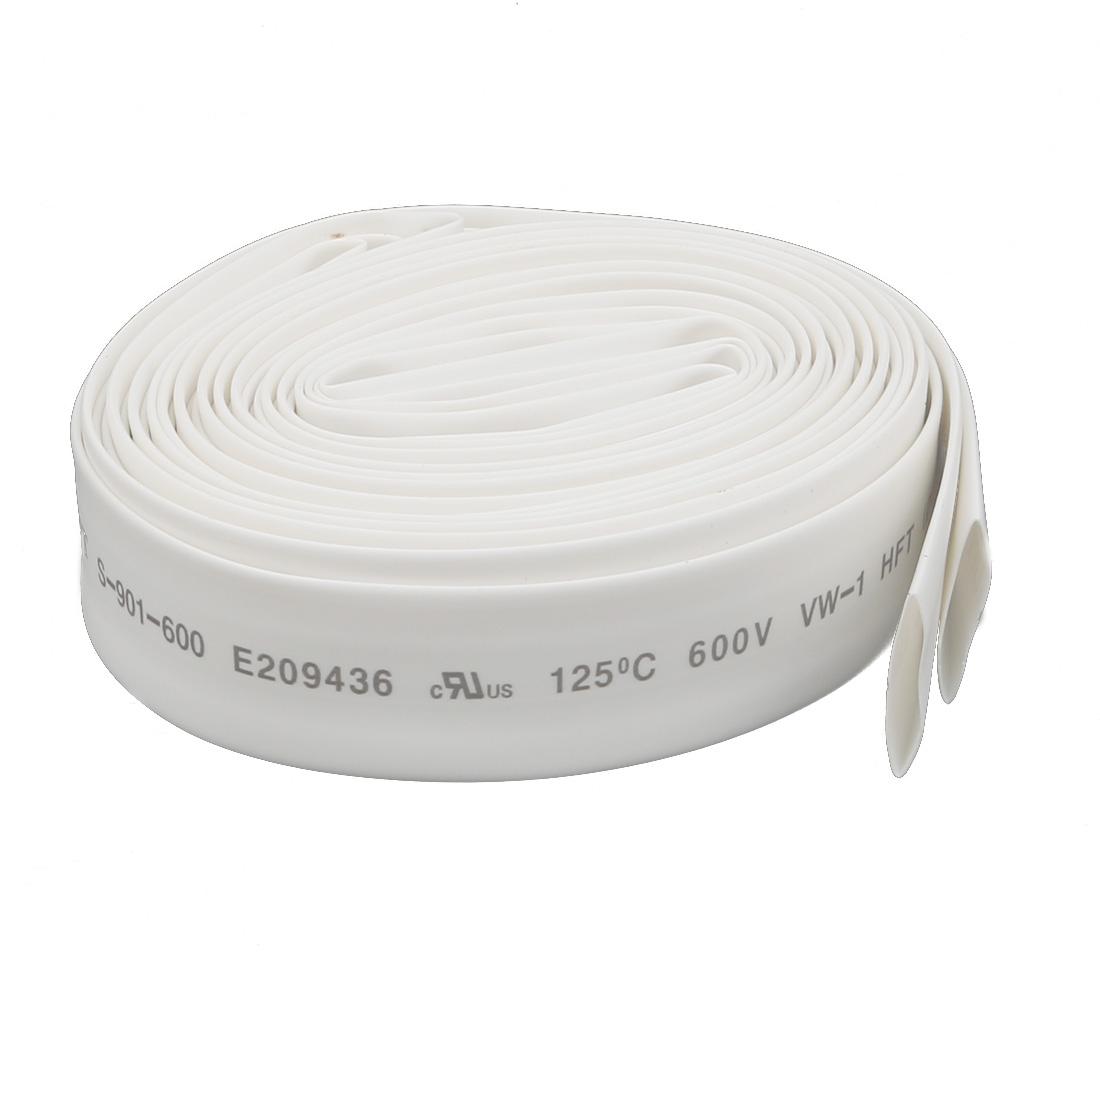 5M 0.47in Inner Dia Polyolefin Flame Retardant Tube White for Wire Repairing